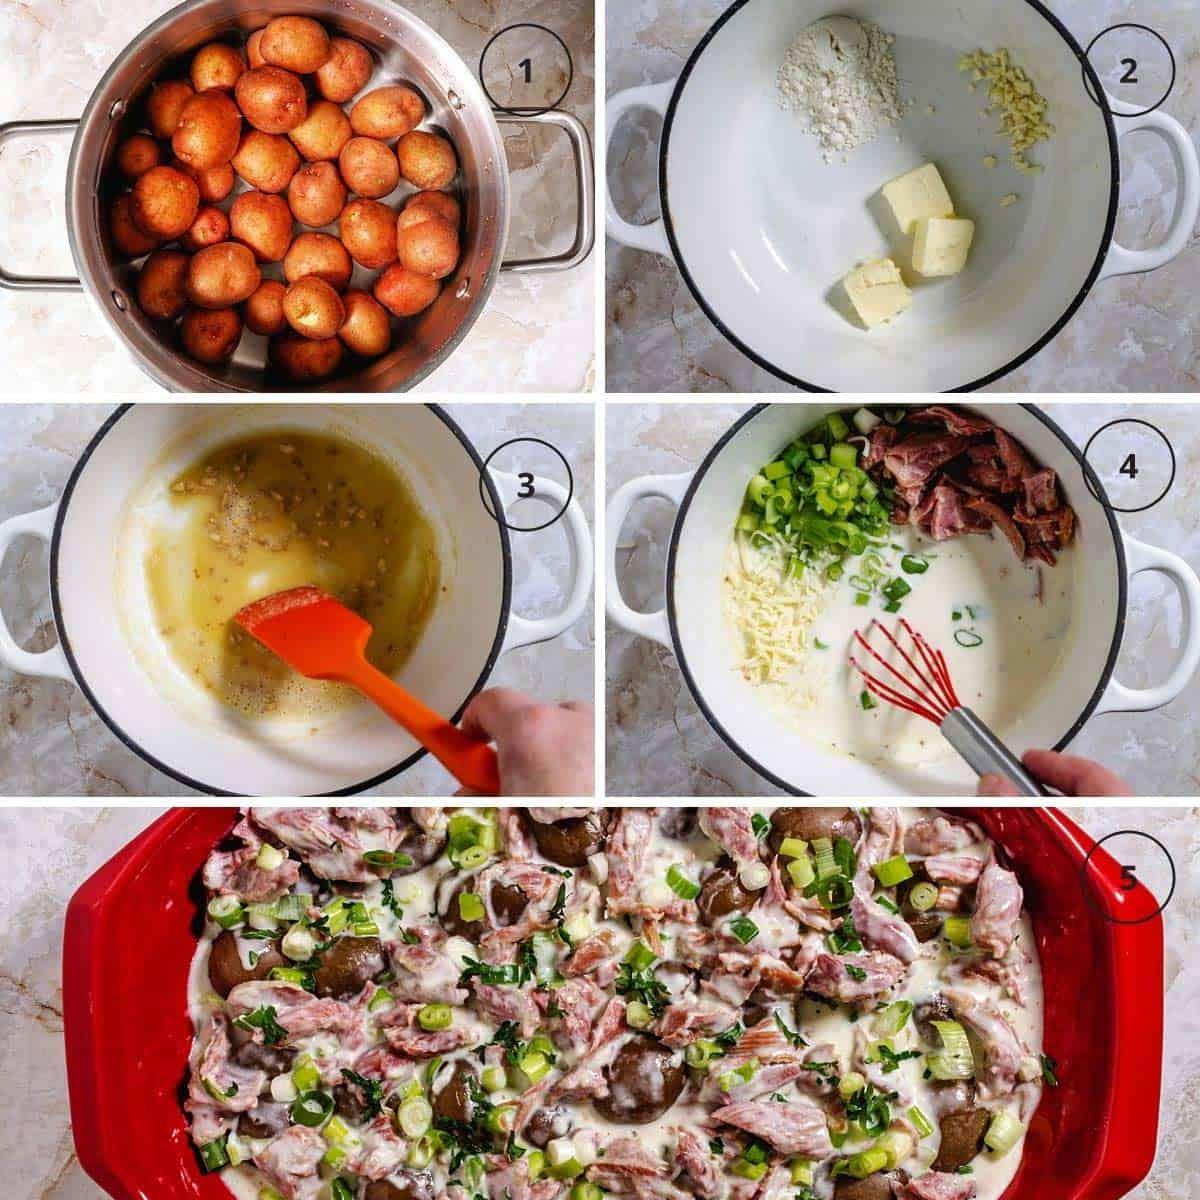 steps to making creamy German potato dish